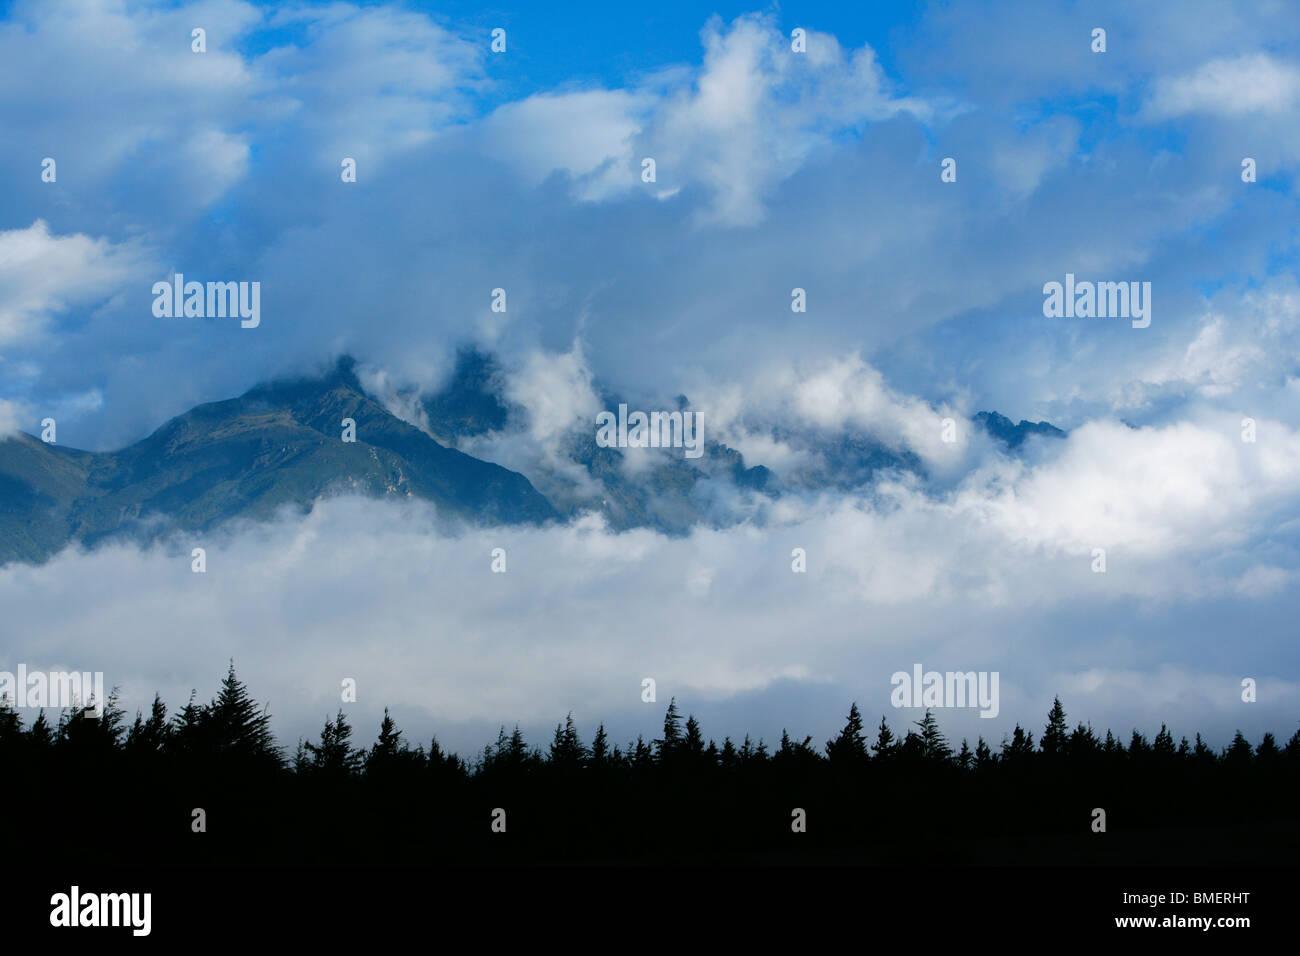 Yulong Snow Mountain, Yulong Naxi Autonomous County, Lijiang City, Yunnan Province, China - Stock Image